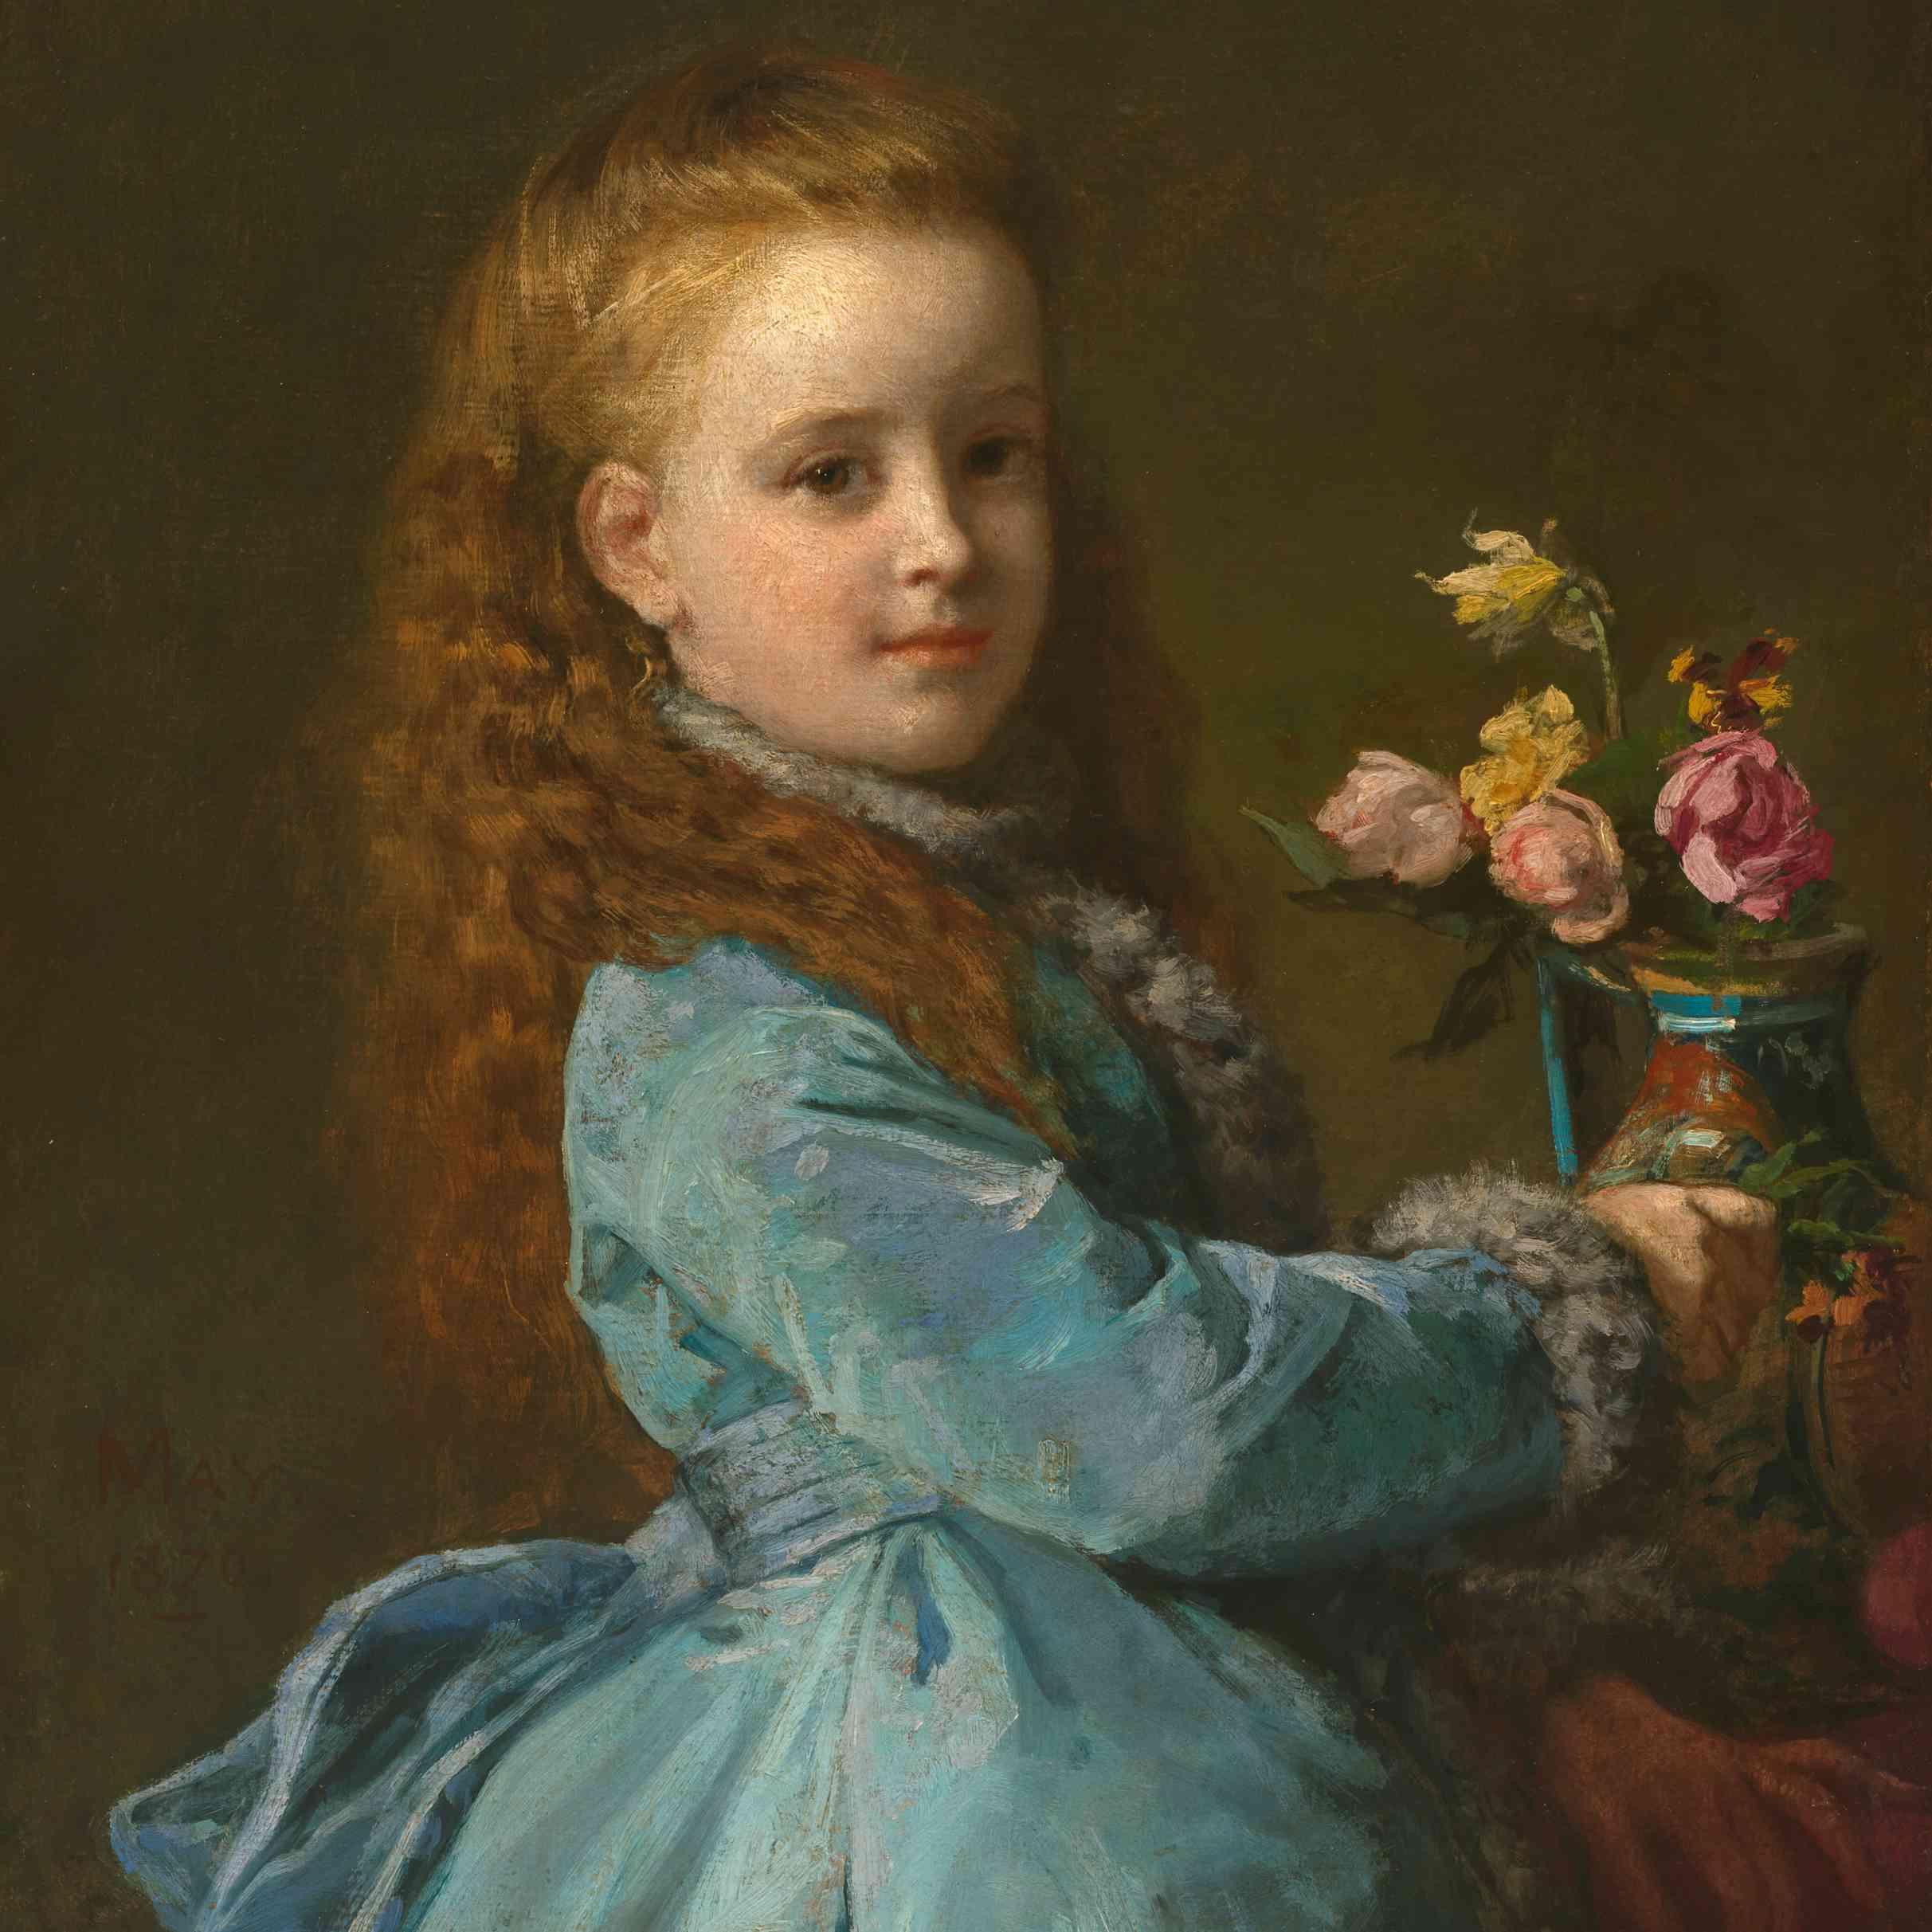 Portrait of Edith Wharton, 1870